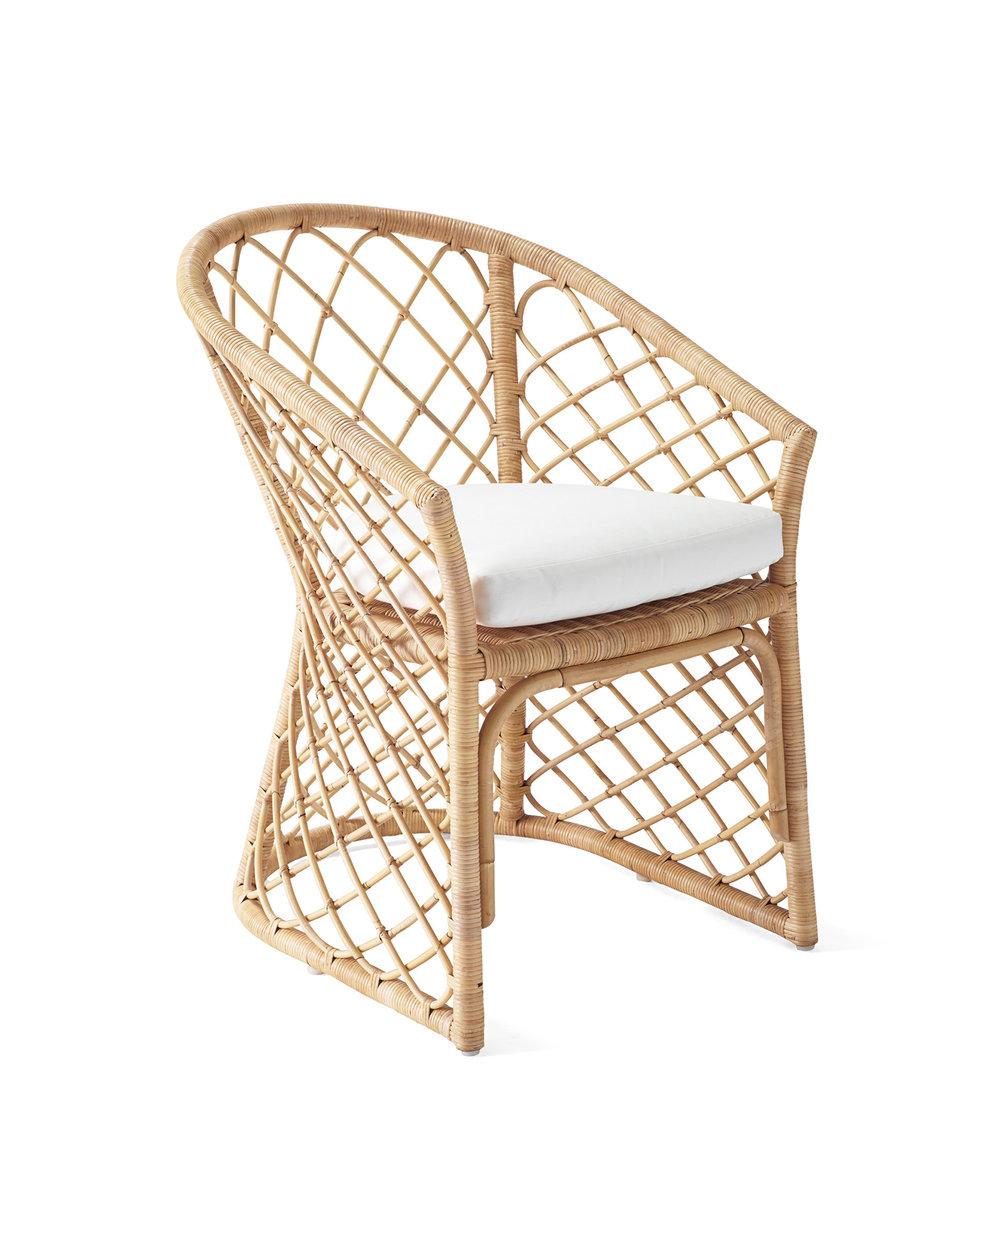 Furn_Avalon_Dining_Chair_Natural_White_Angle_MV_0593_Crop_SH.jpg